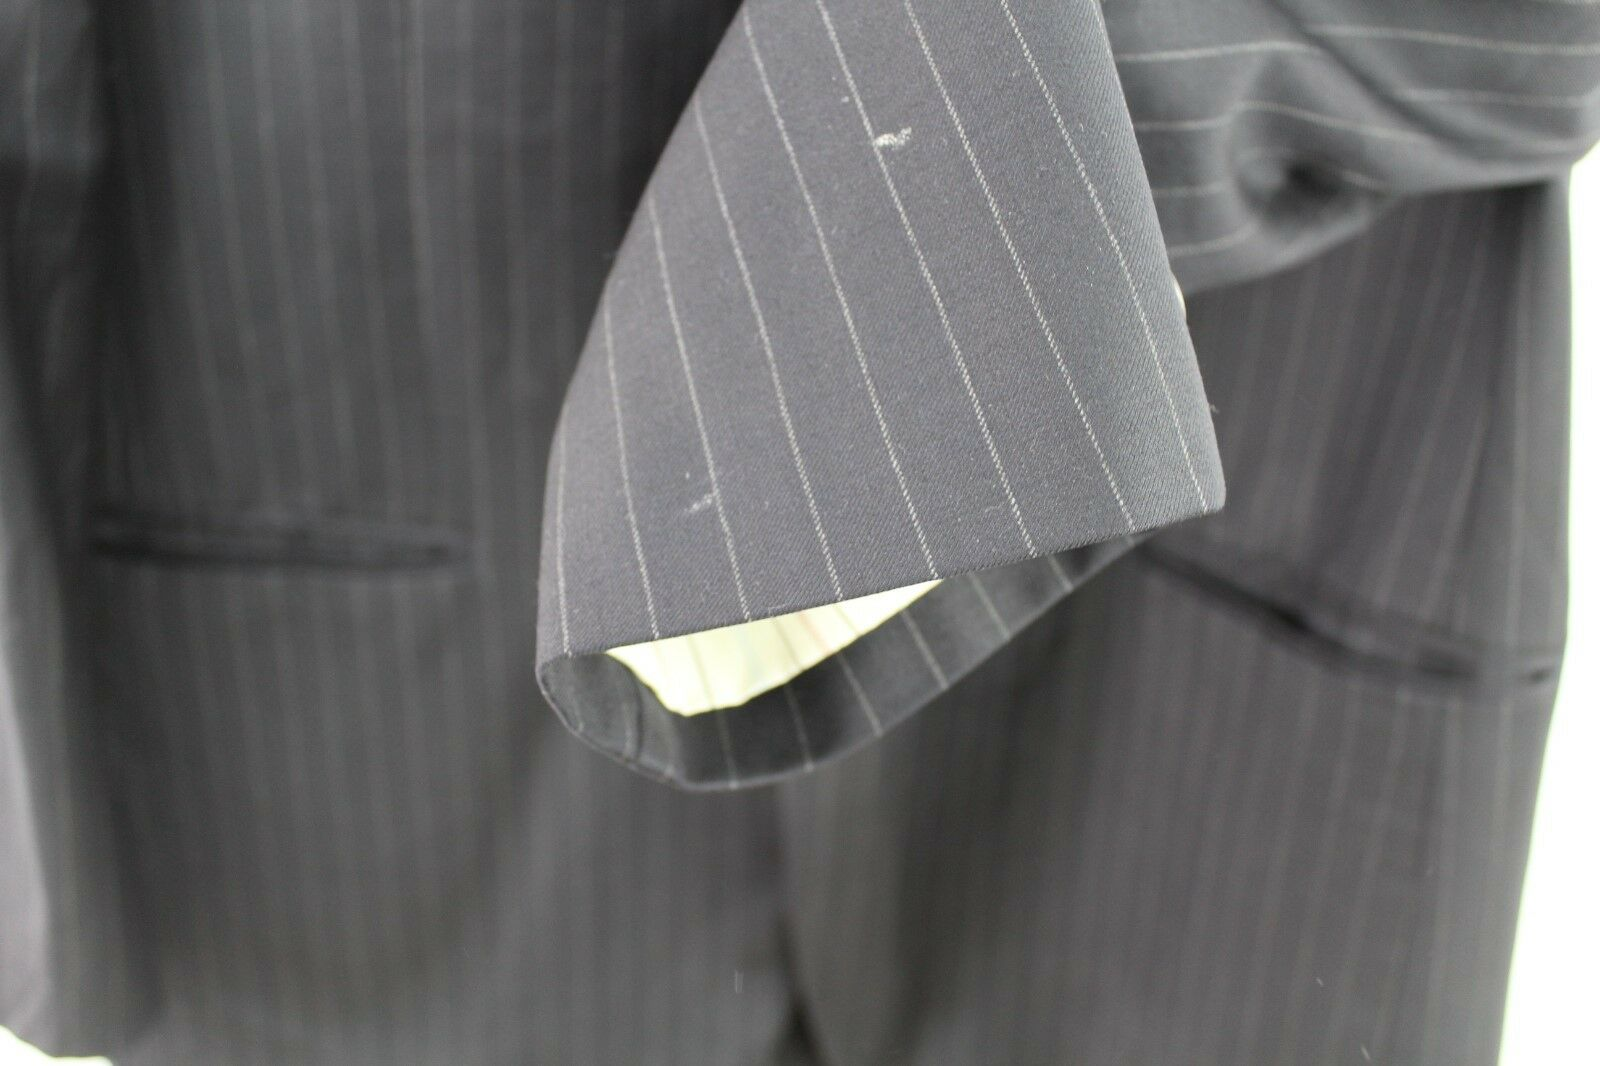 Homme No.S774 RALPH LAUREN Blazer Jacket Taille 44 L Stock No.S774 Homme 03ed59